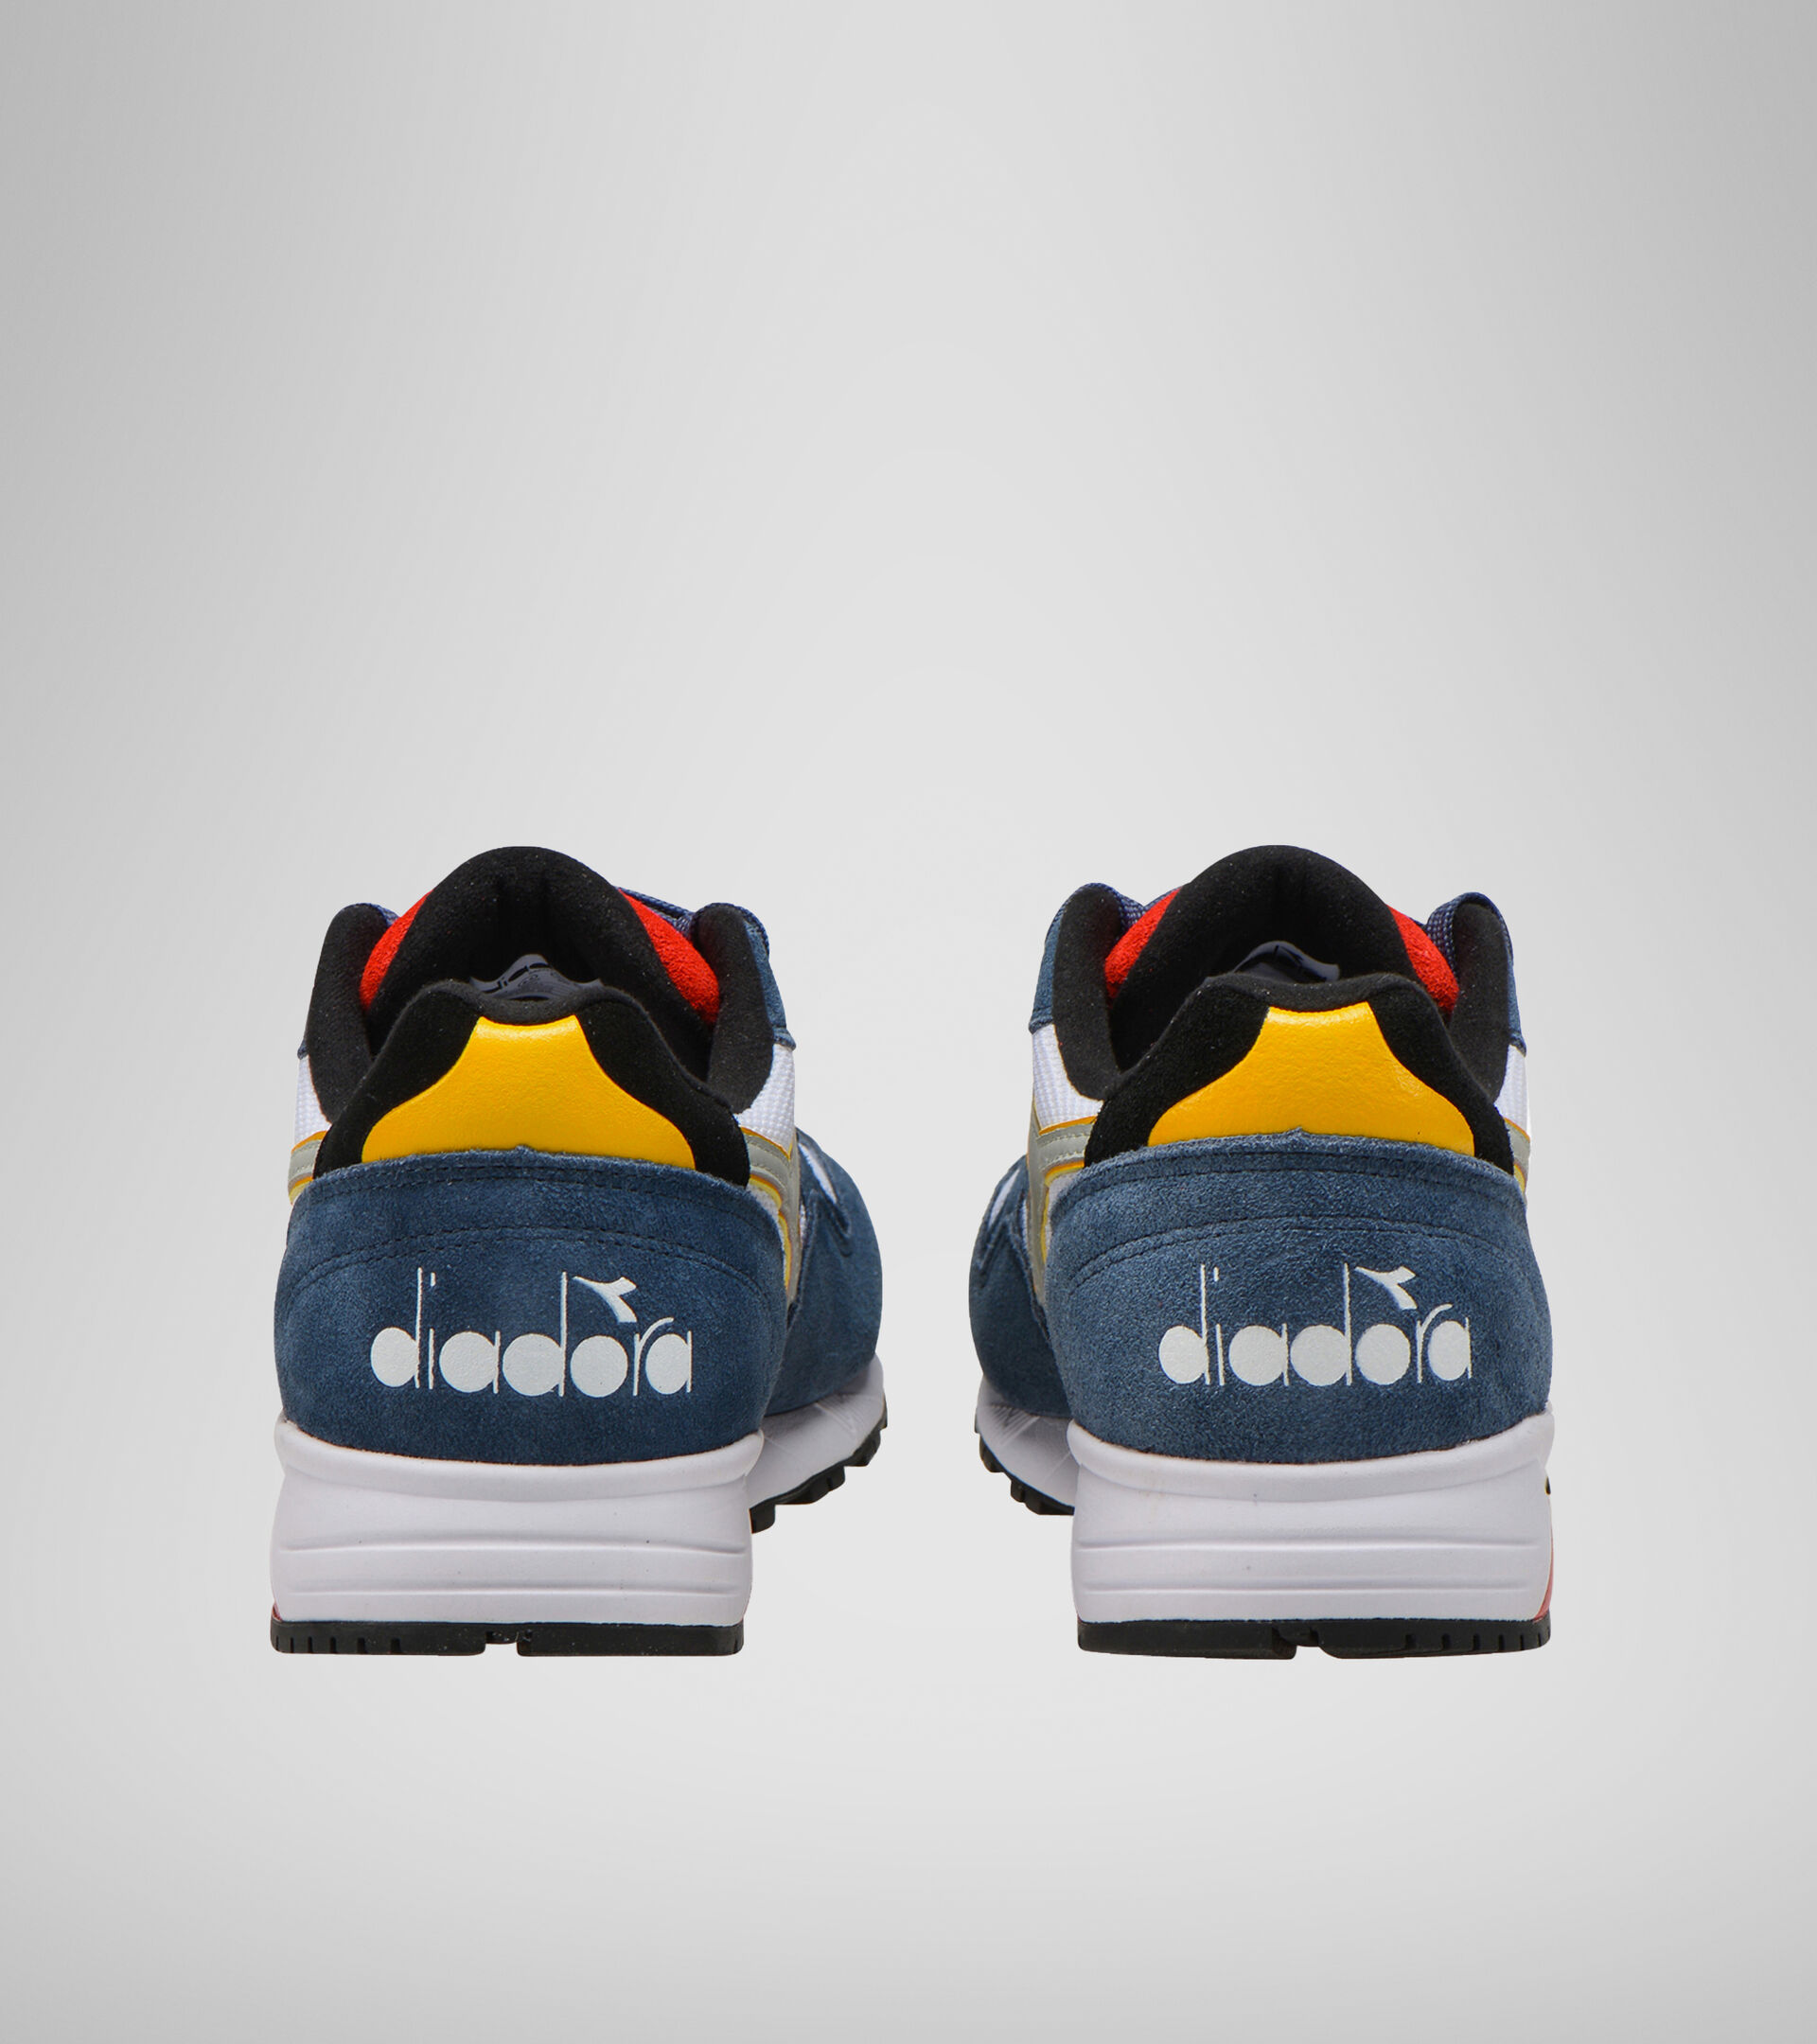 Footwear Sportswear UNISEX N902 S MEZCLILLA OSCR/BLCO/ROJO INTEN Diadora